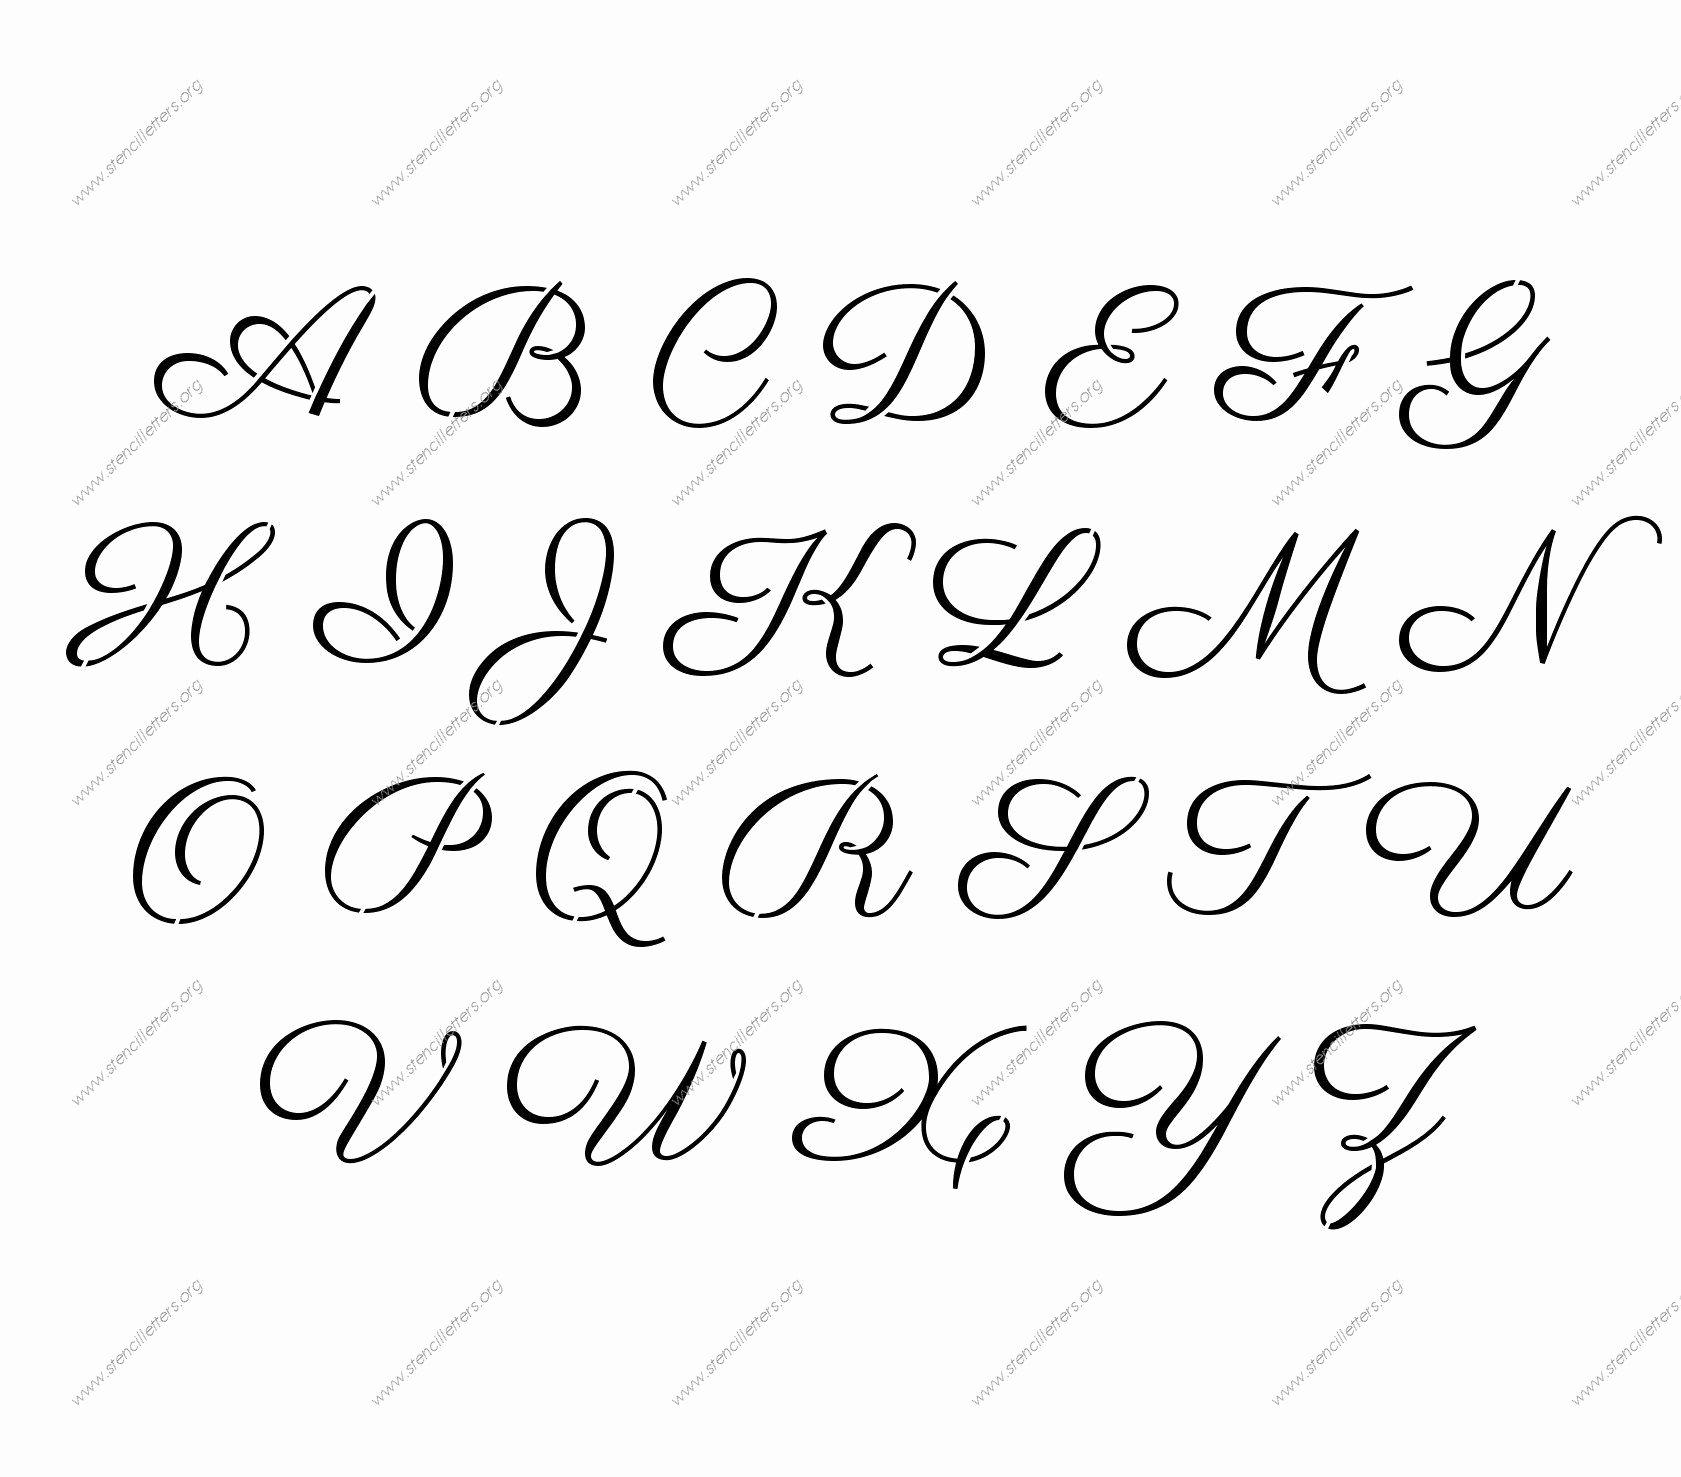 Free Printable Stencil Letters Unique Free Printable Alphabet Stencil Letters Template